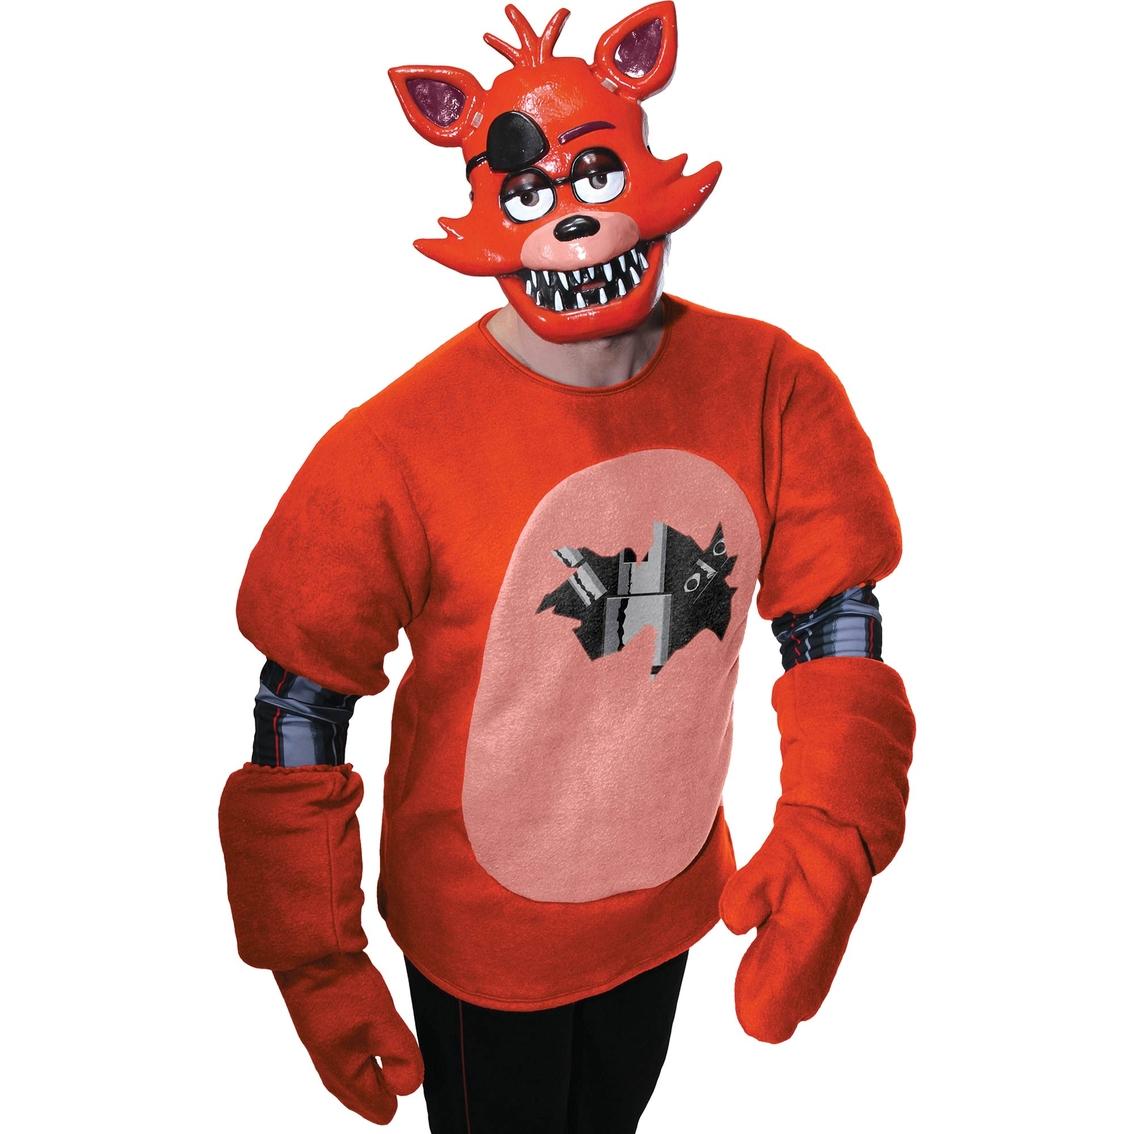 Rubies Costume Fnaf Foxy Adult Mask Masks Apparel Shop The